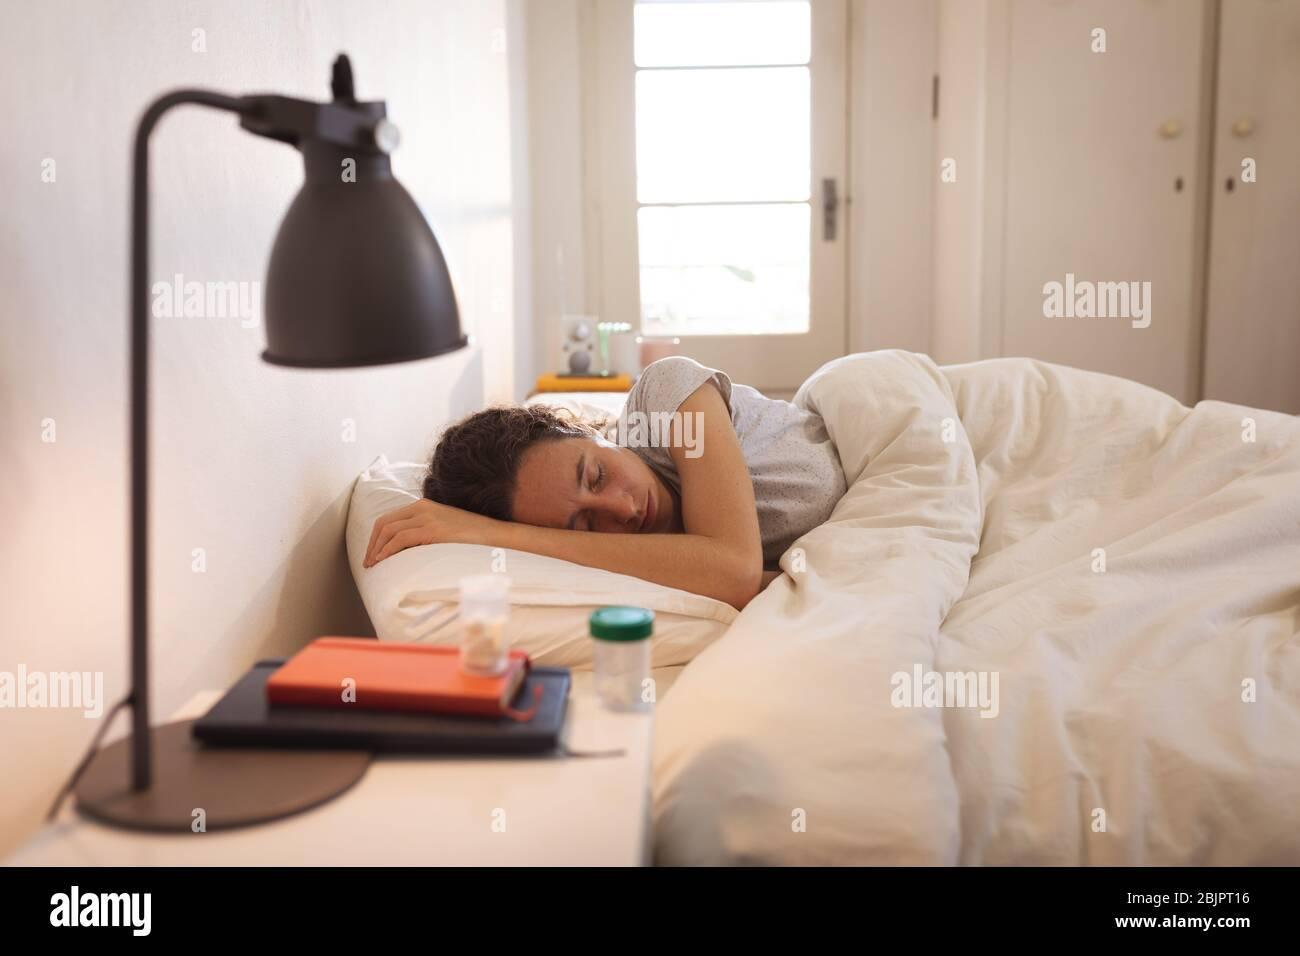 Sick Caucasian woman self isolating and social distancing in quarantine lockdown during coronavirus Stock Photo